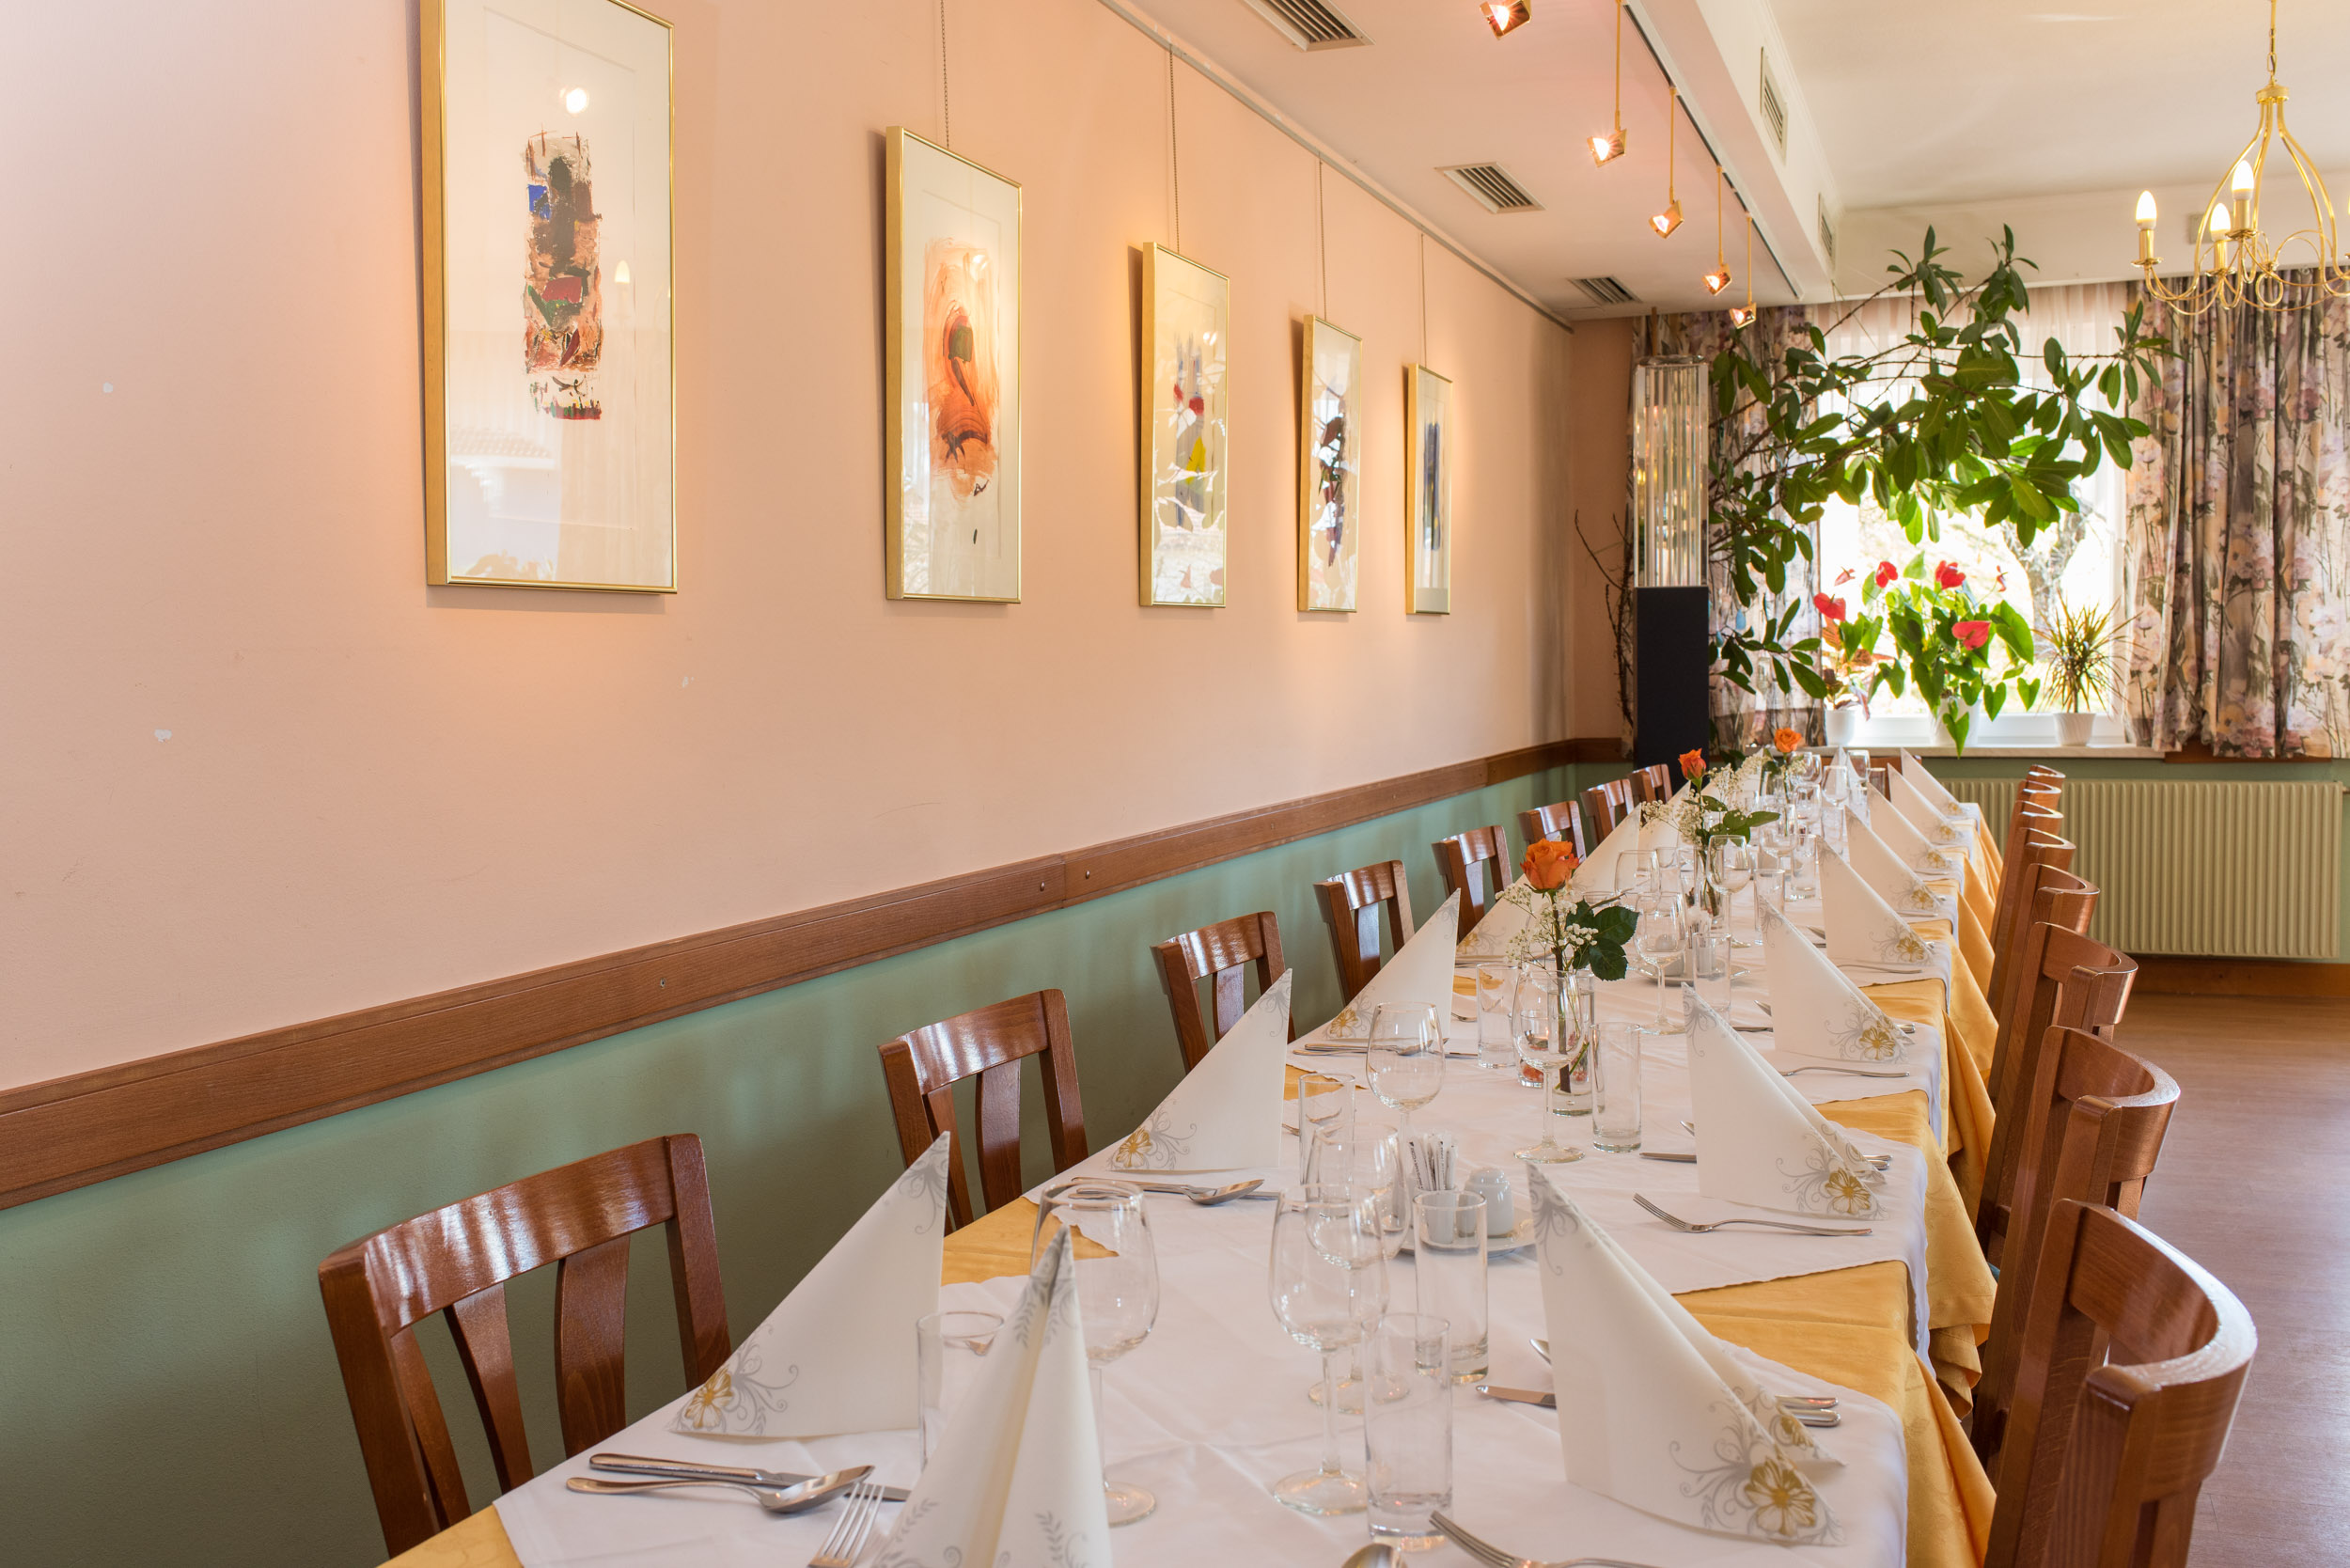 Speisesaal-perfekt-geeignet-für-Familienfeiern